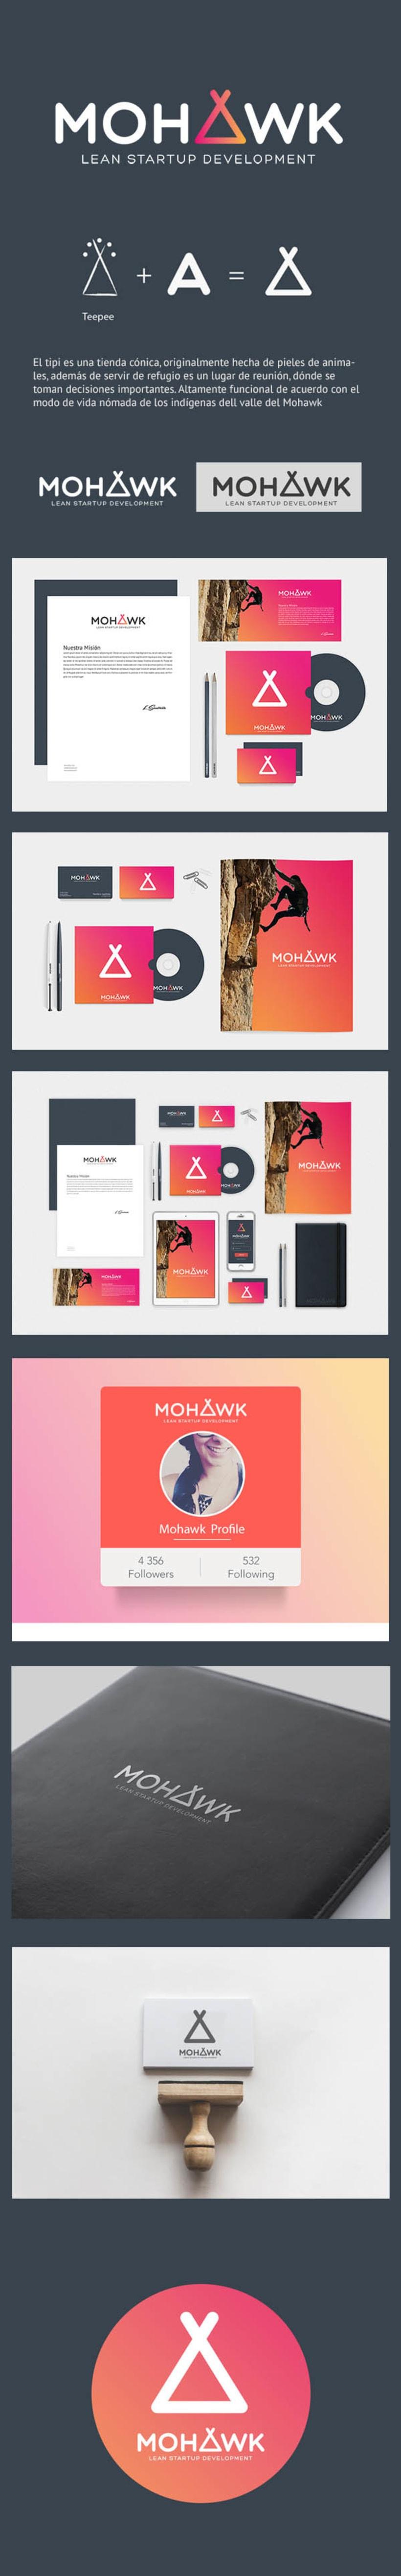 MOHAWK -1